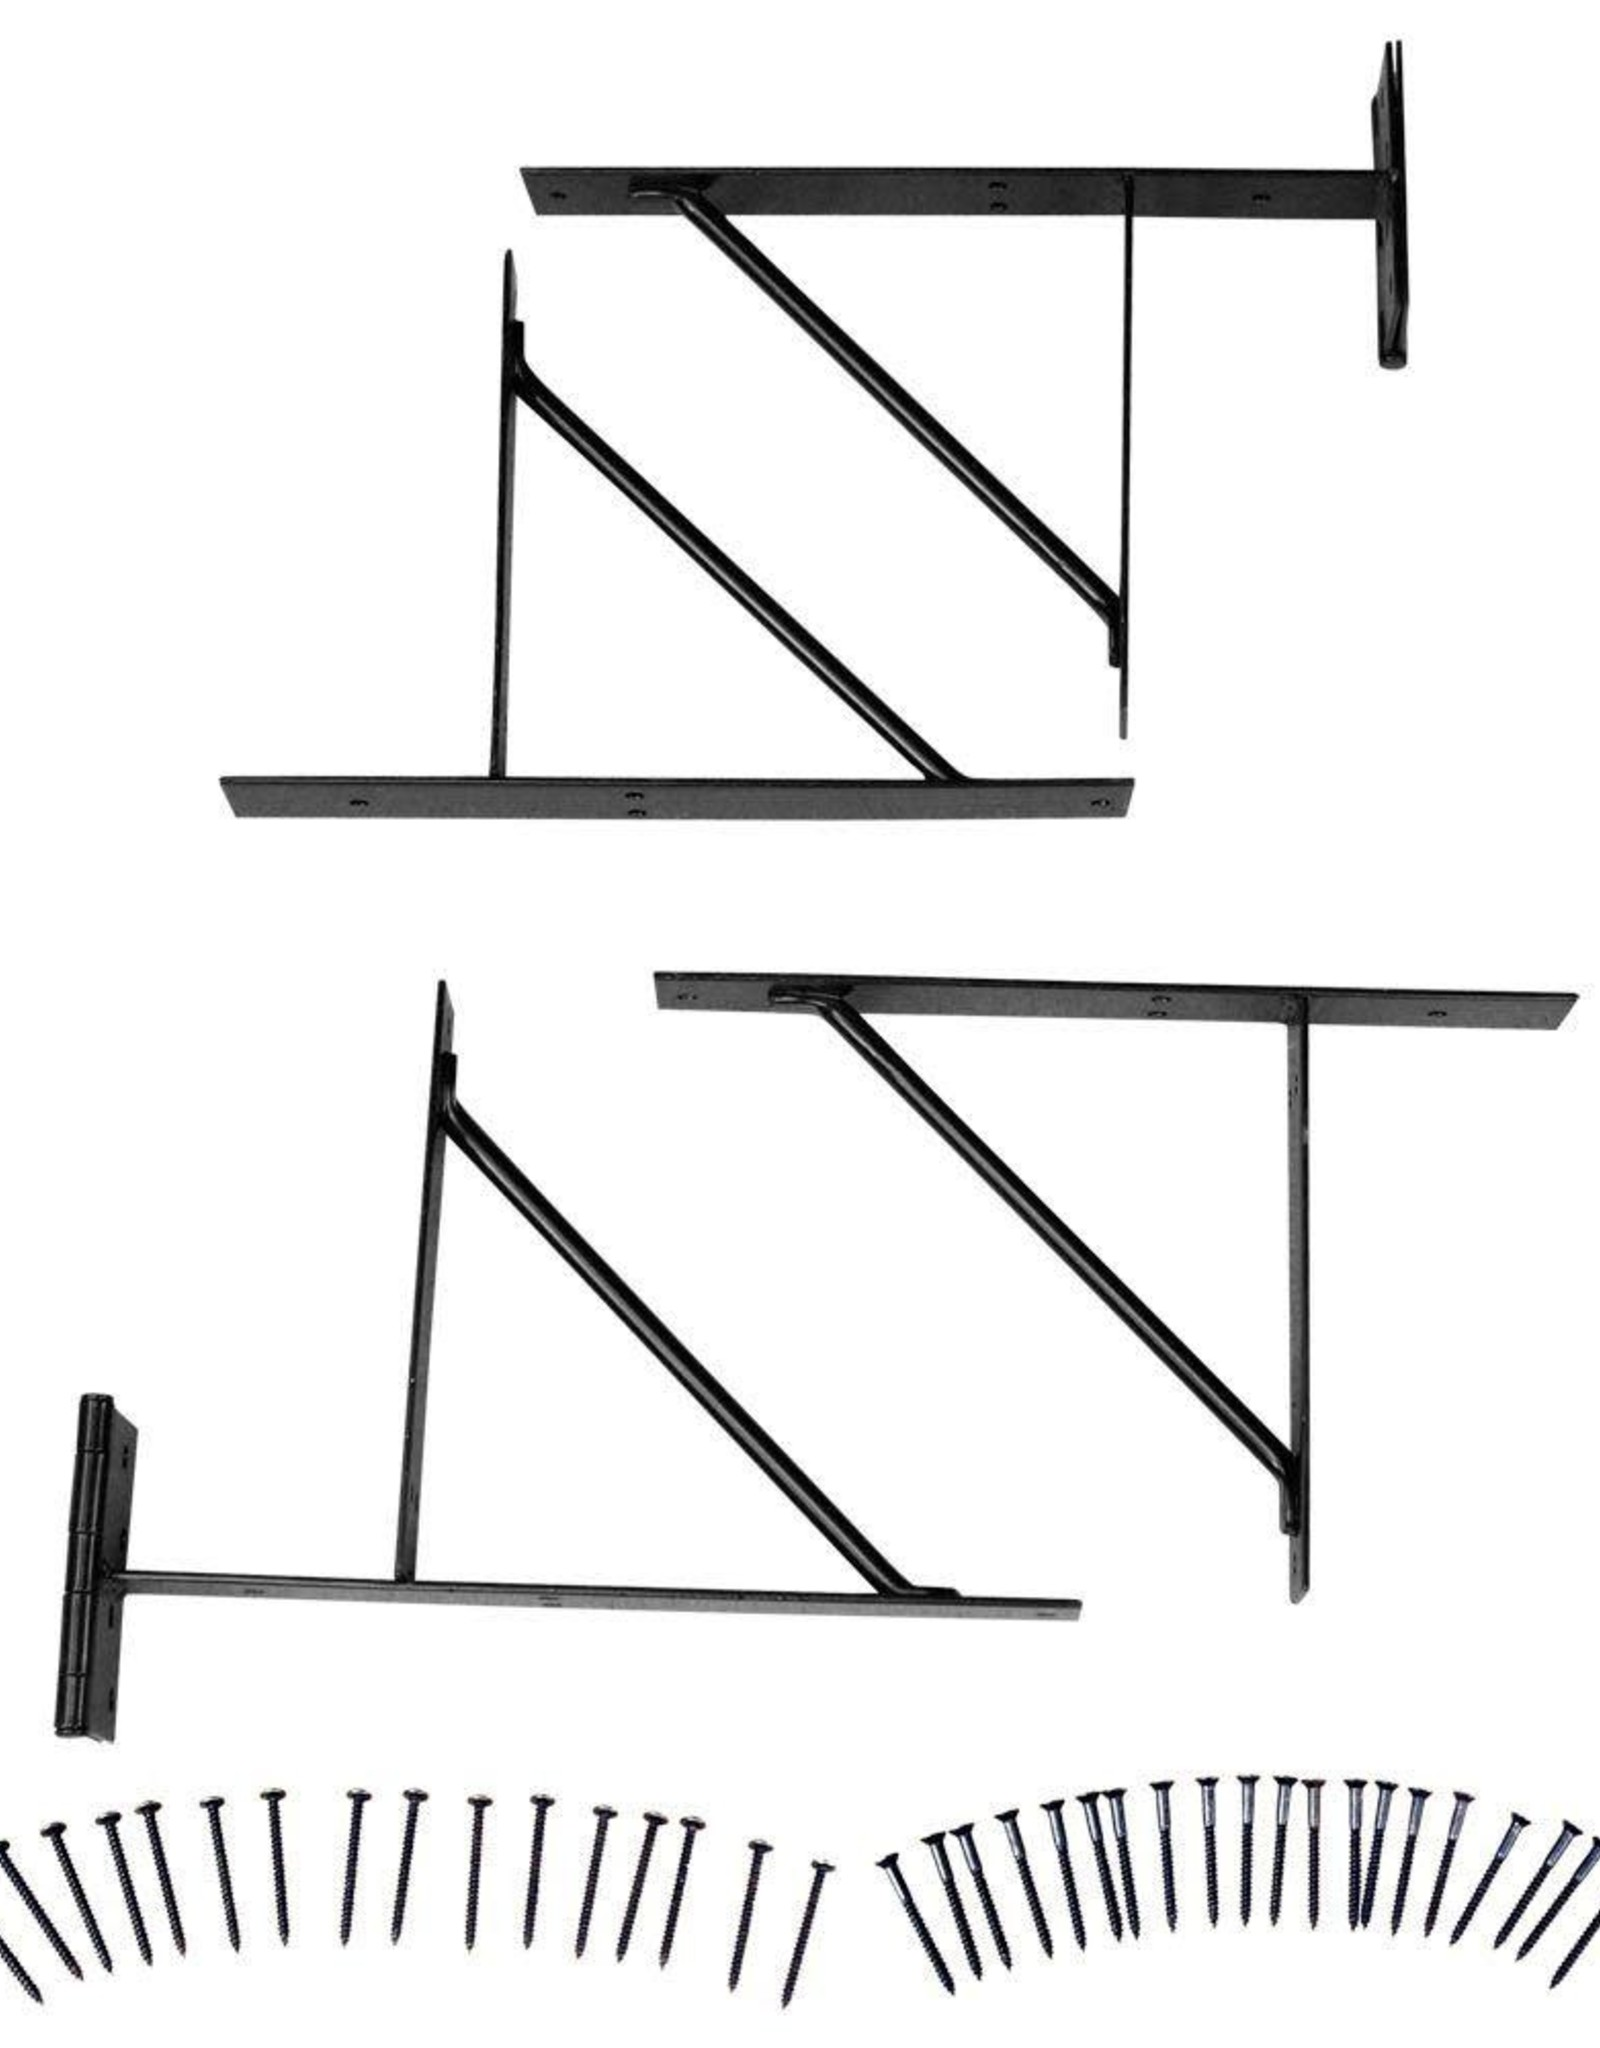 PPG Architectural Coating Homax Easy Gate - No Sag Bracket Kit